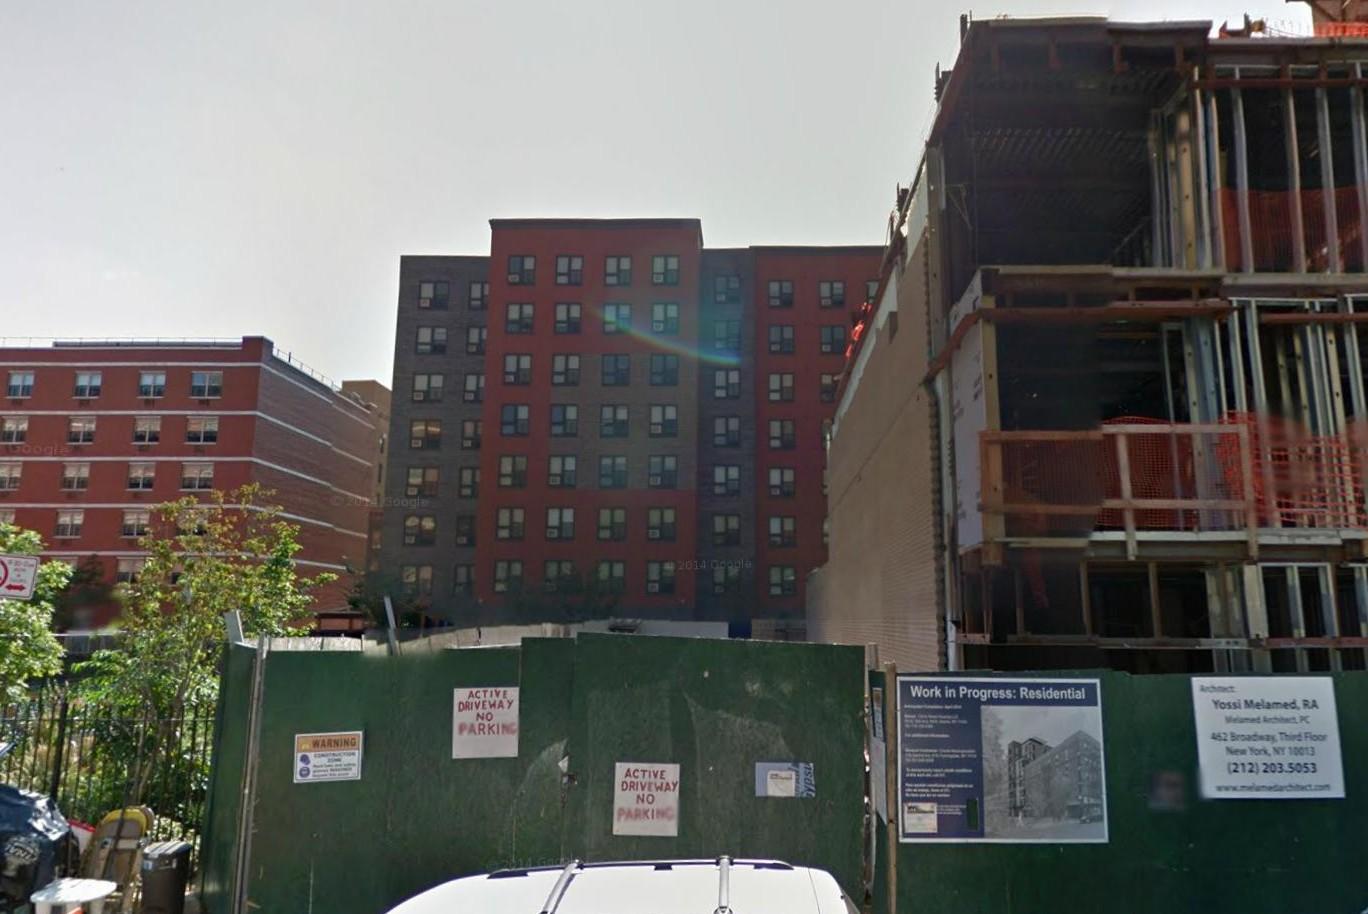 44 East 132nd Street